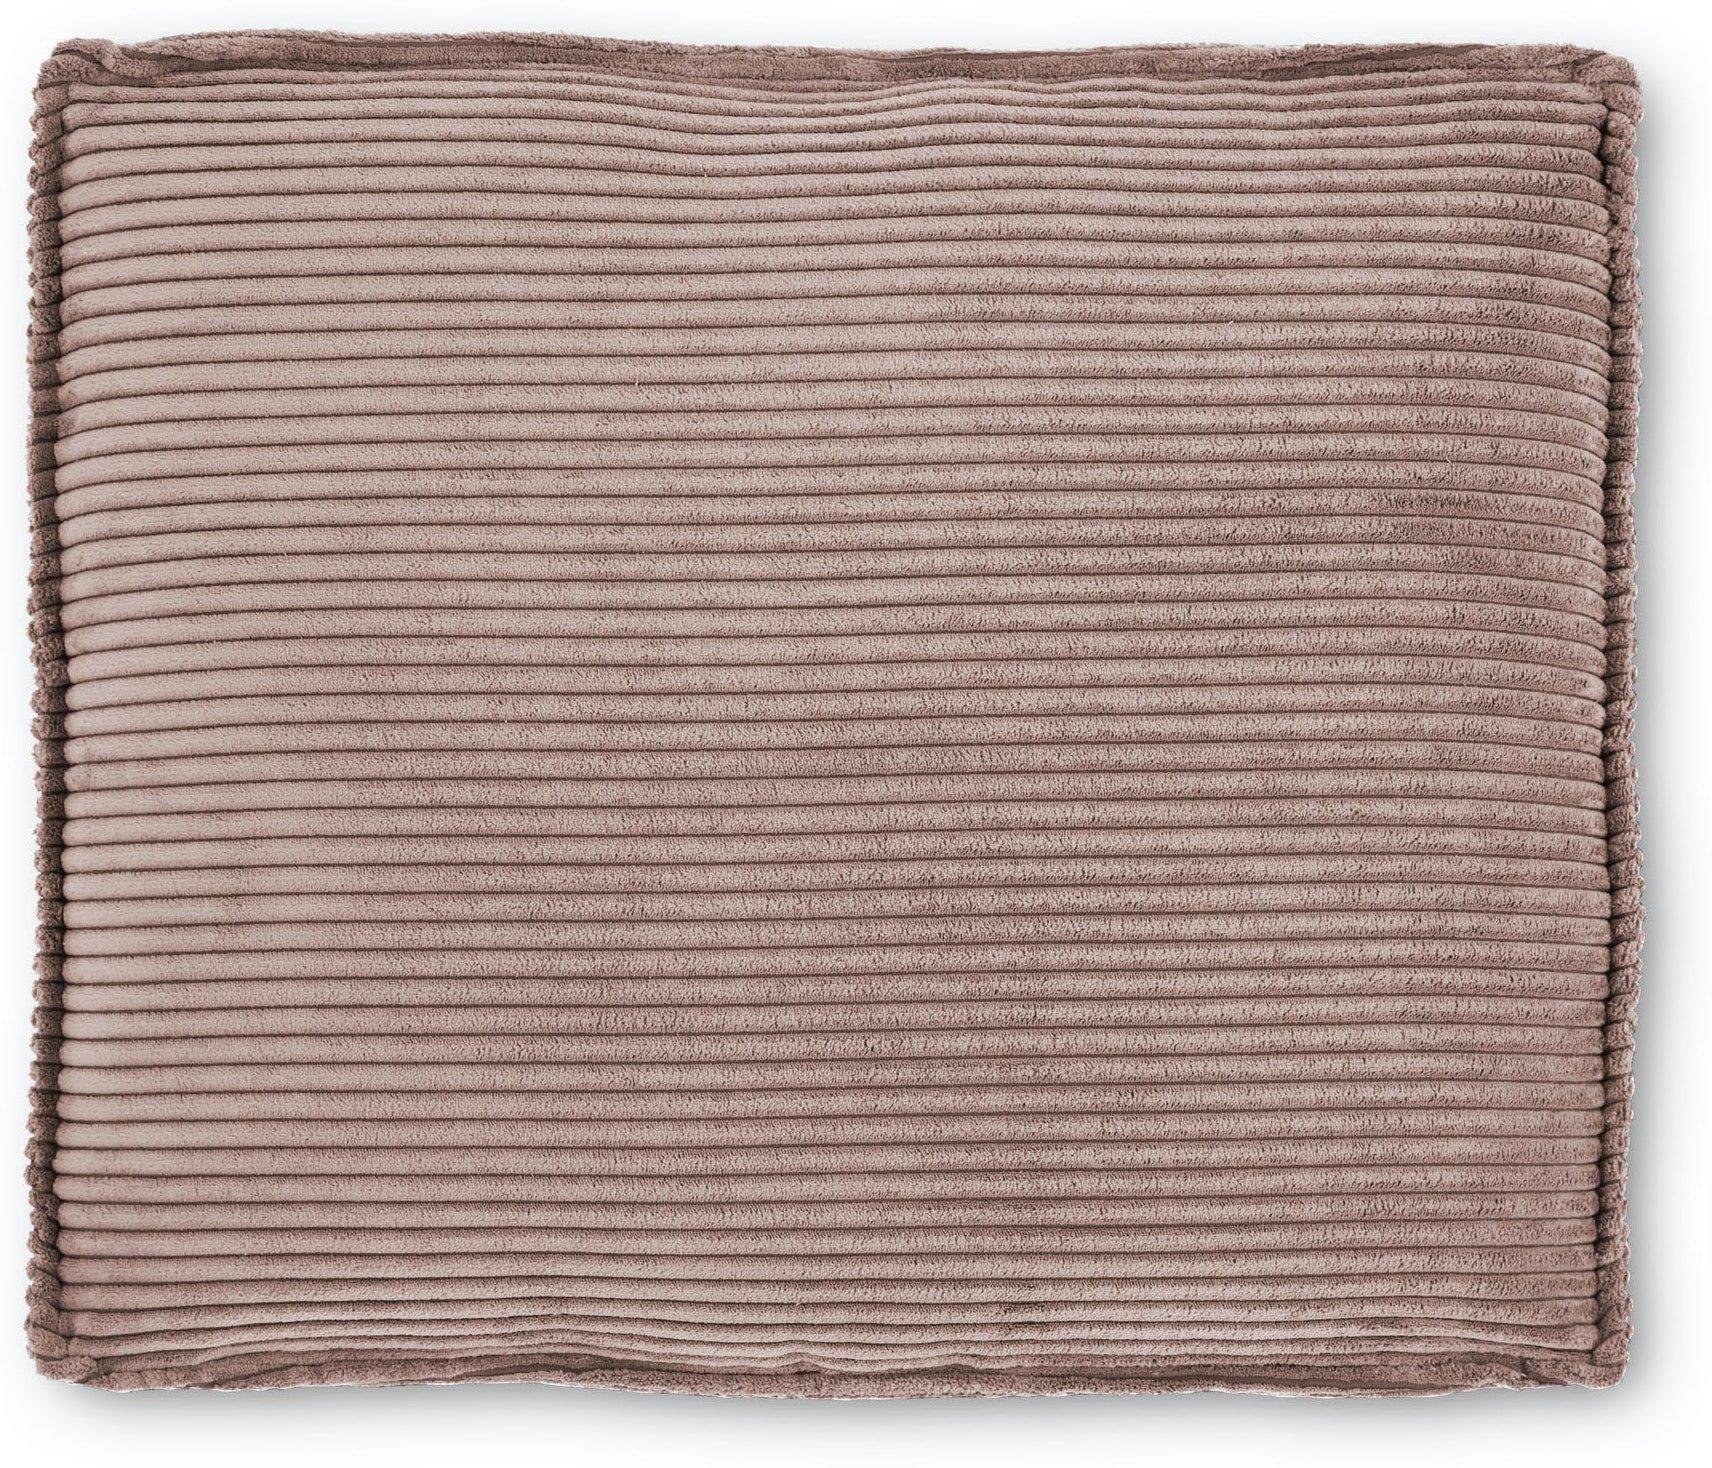 Blok, Sofa tilbehørspude, Fløjl by LaForma (H: 60 cm. B: 70 cm. L: 15 cm., Lyserød)